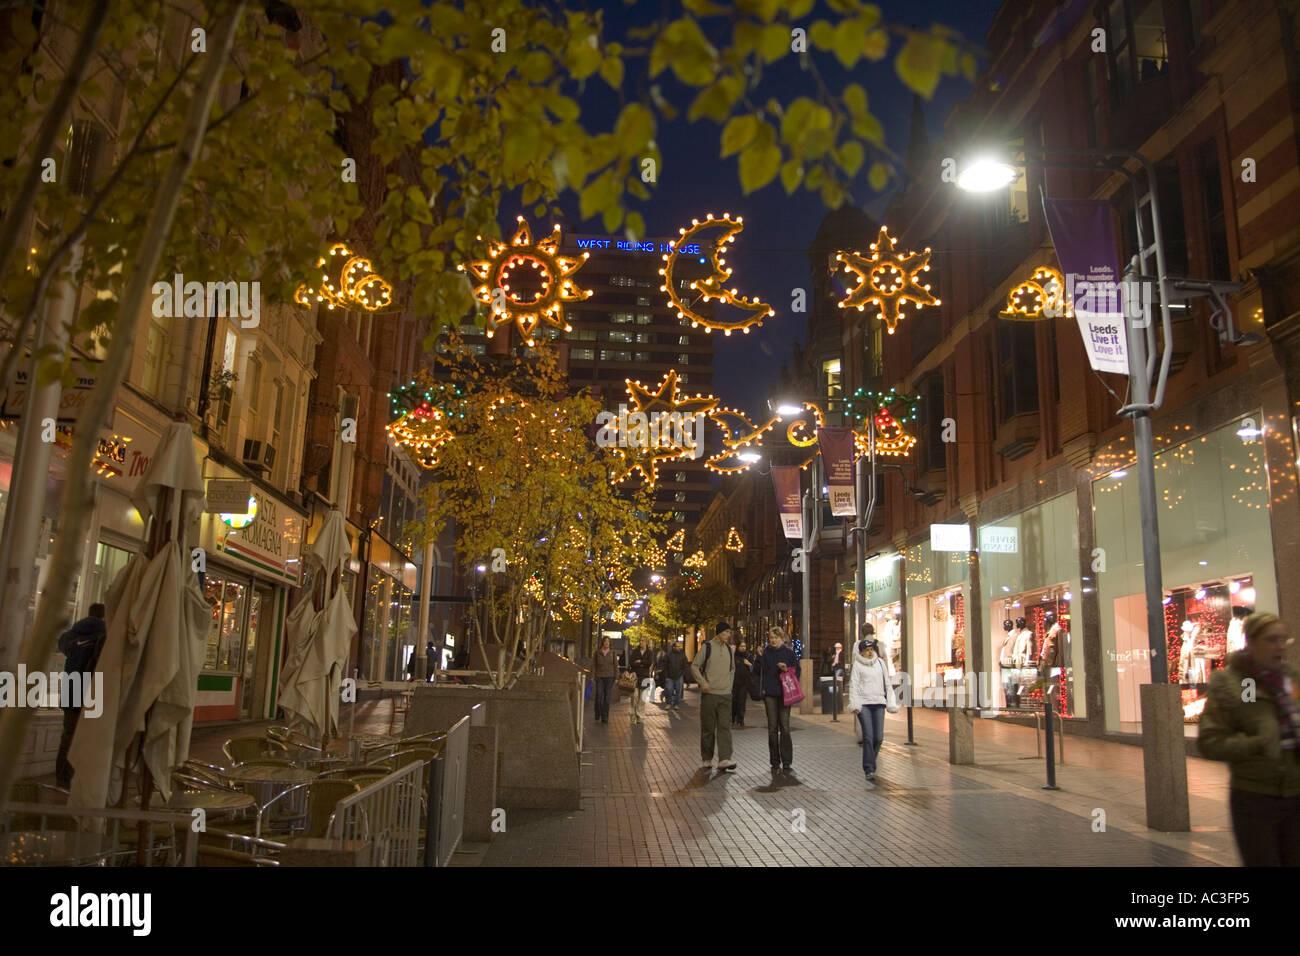 Christmas Street Light Decoration People Walking Down